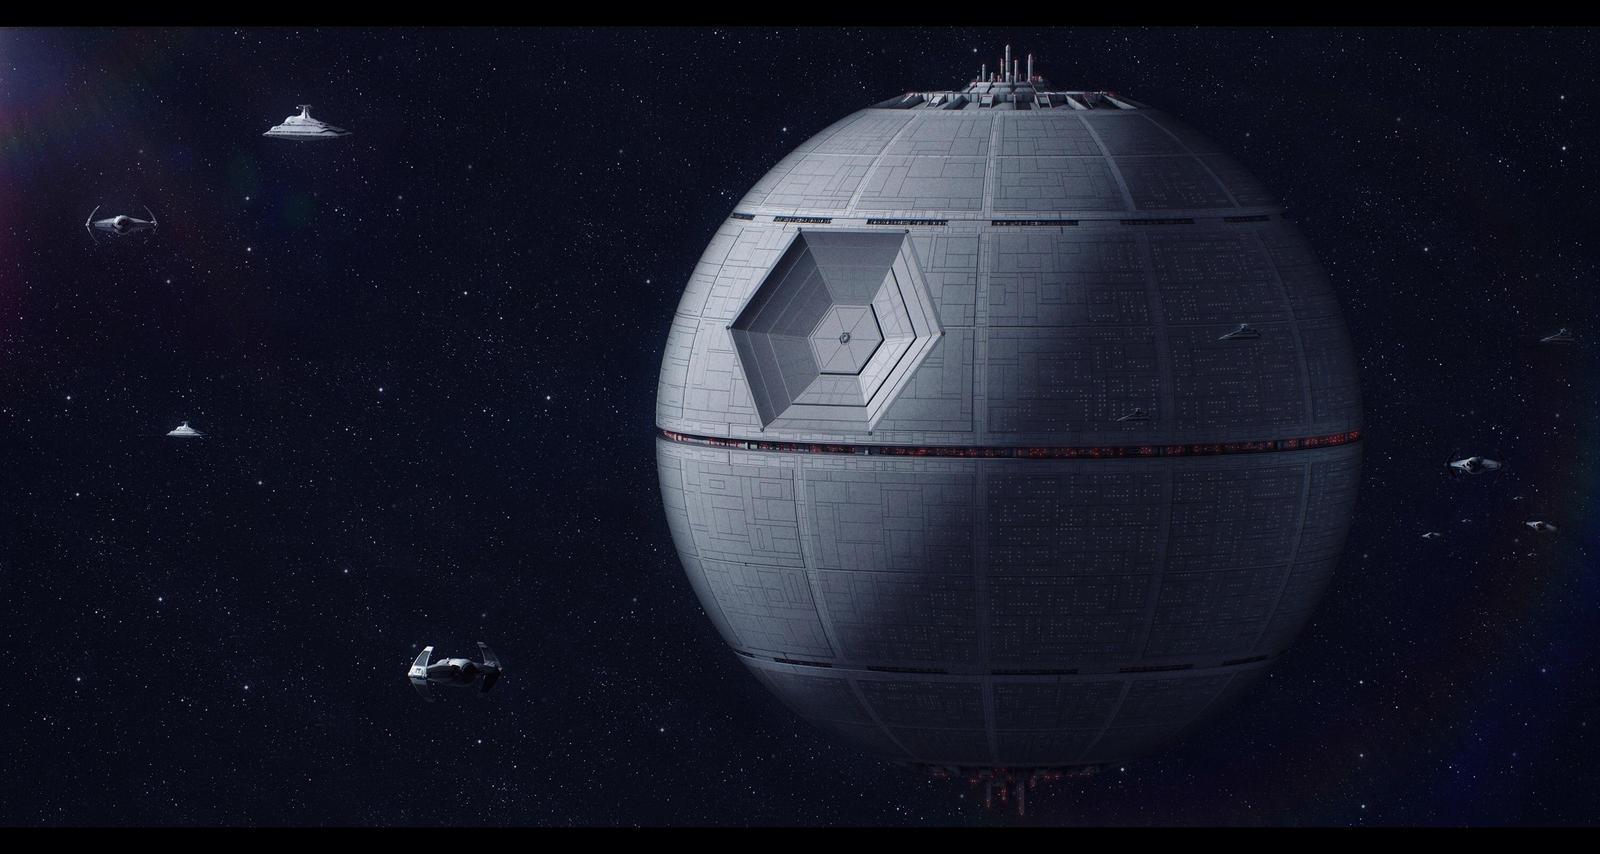 The Ultimate Weapon (Tarkin's Death Star) by Shoguneagle